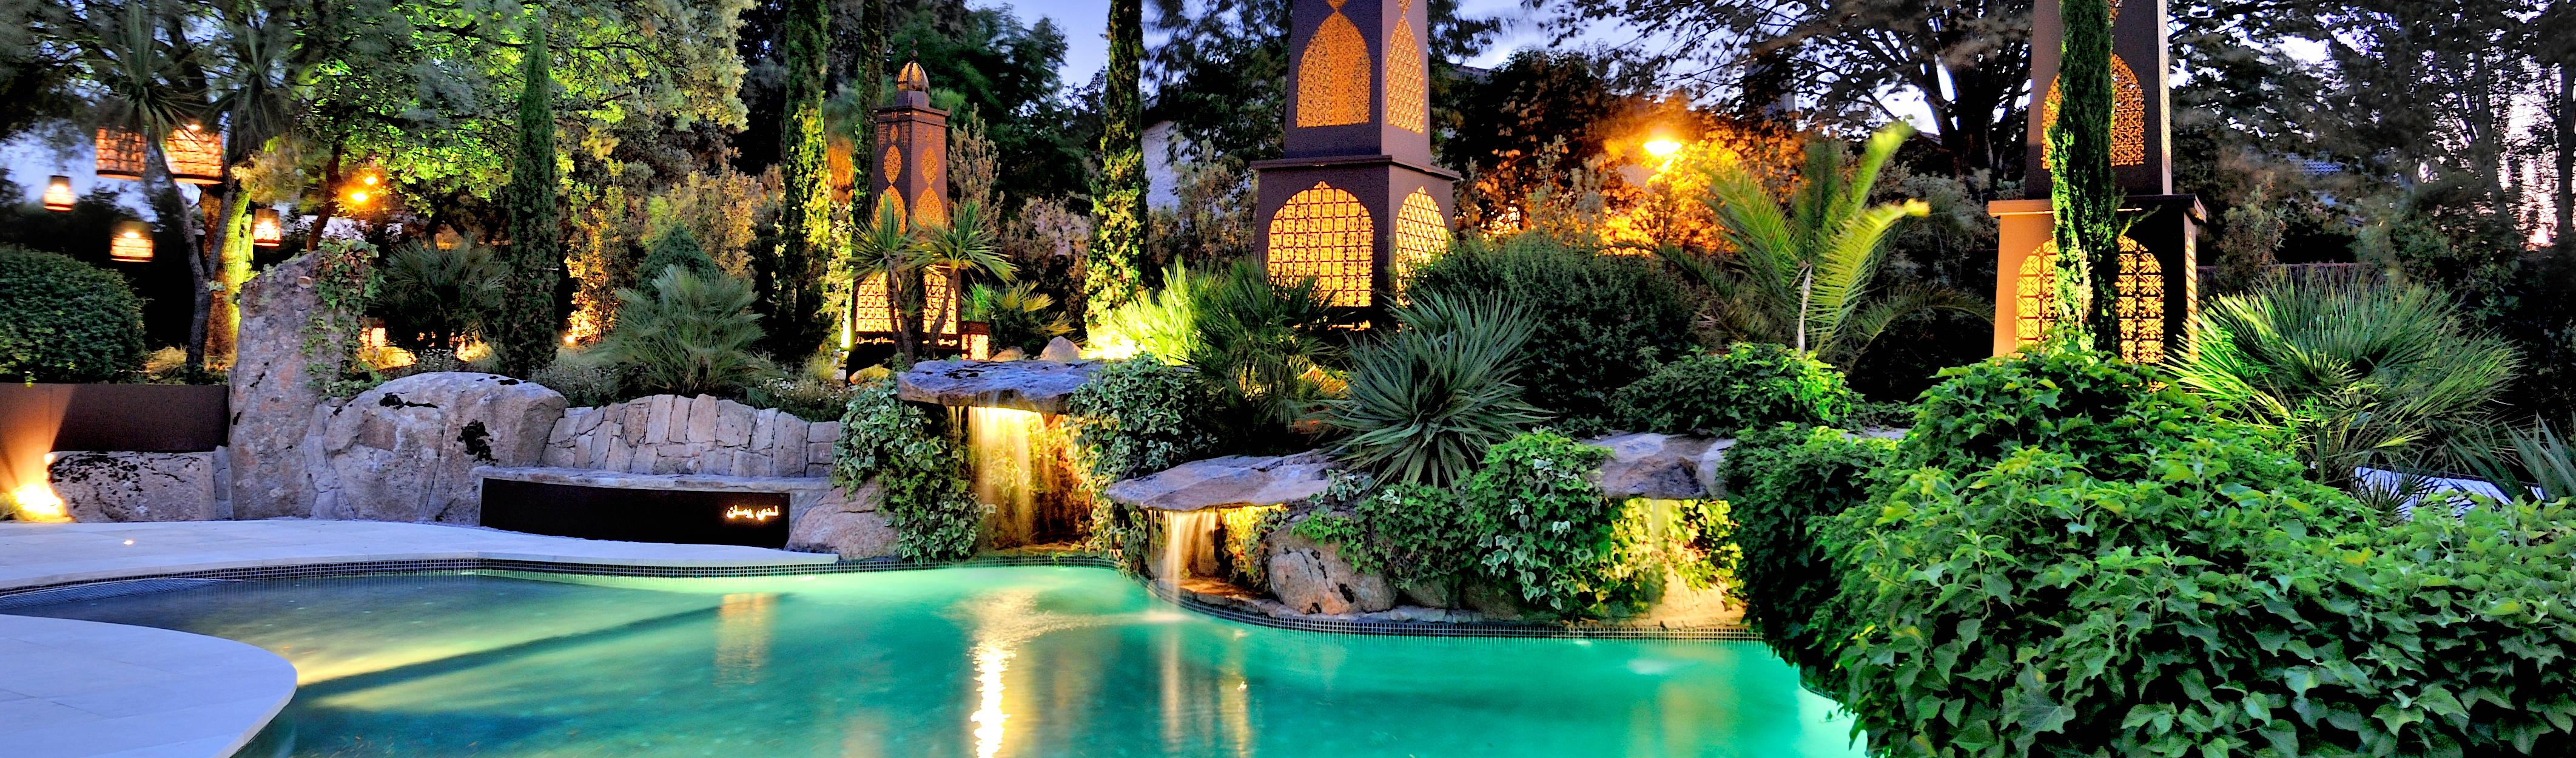 Fernando Pozuelo Landscaping Collection